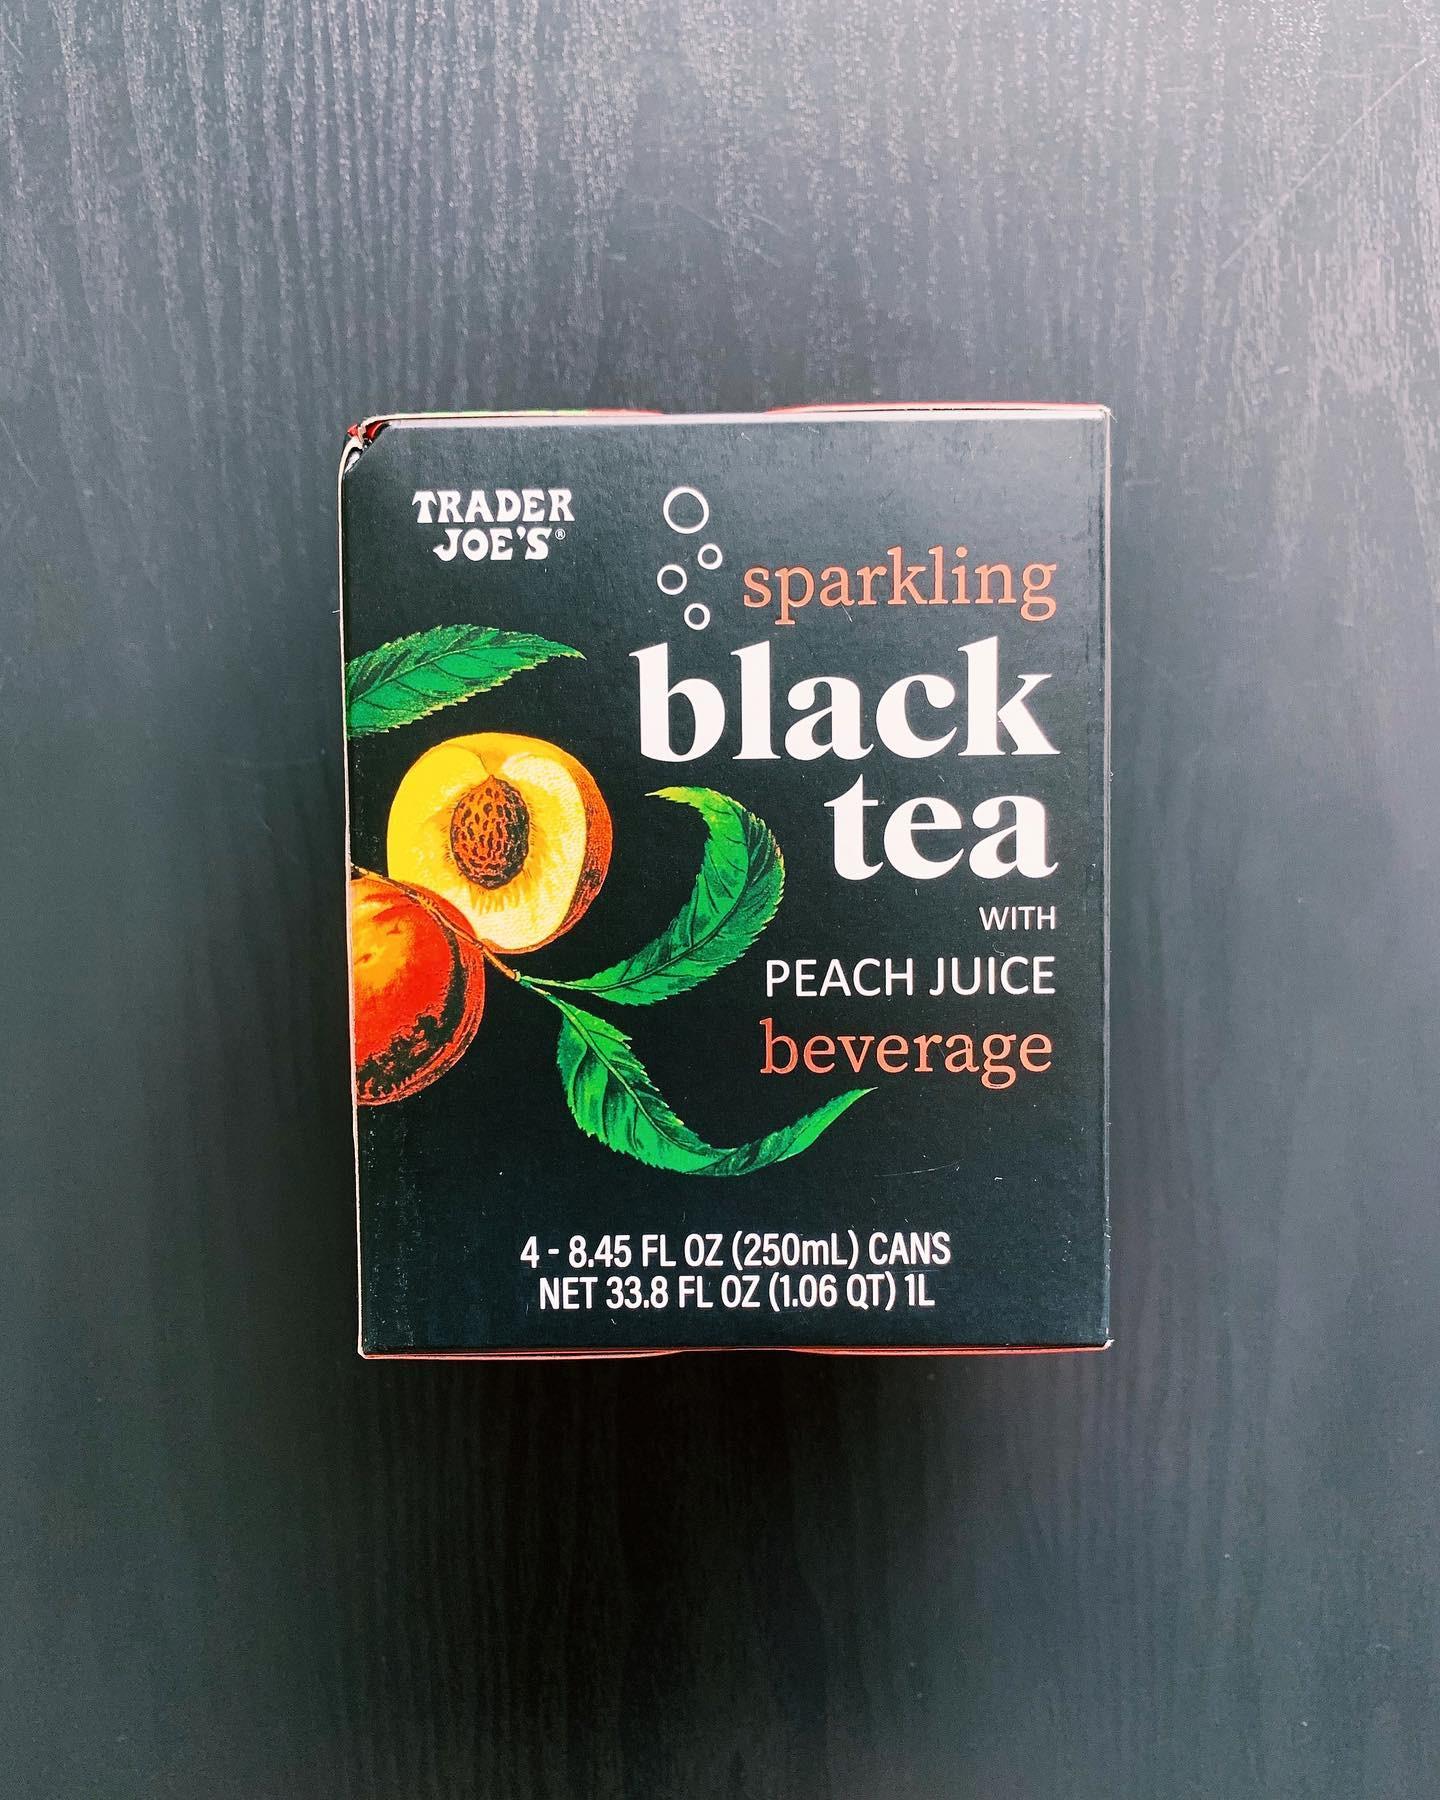 Sparkling Black Tea with Peach Juice Beverage: 8/10